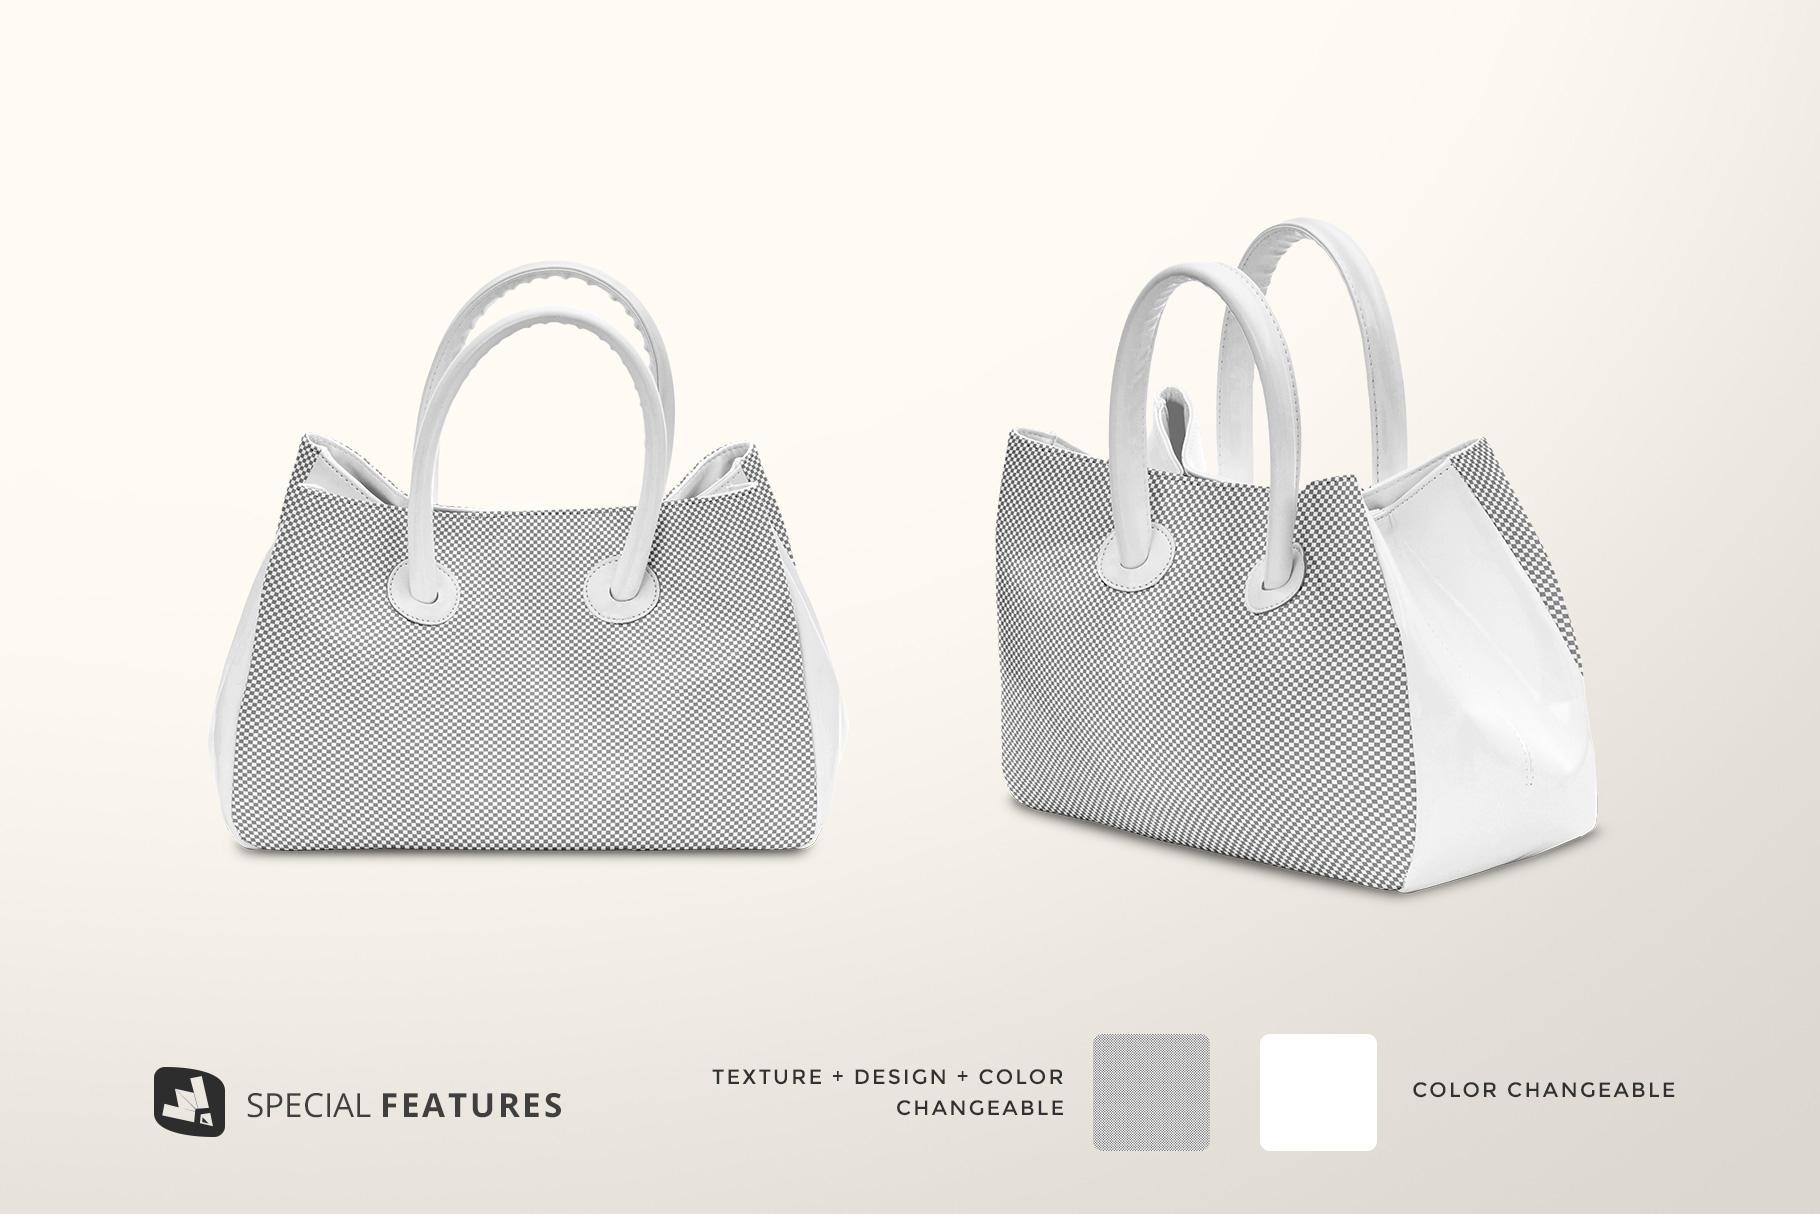 editability of the female handbag mockup